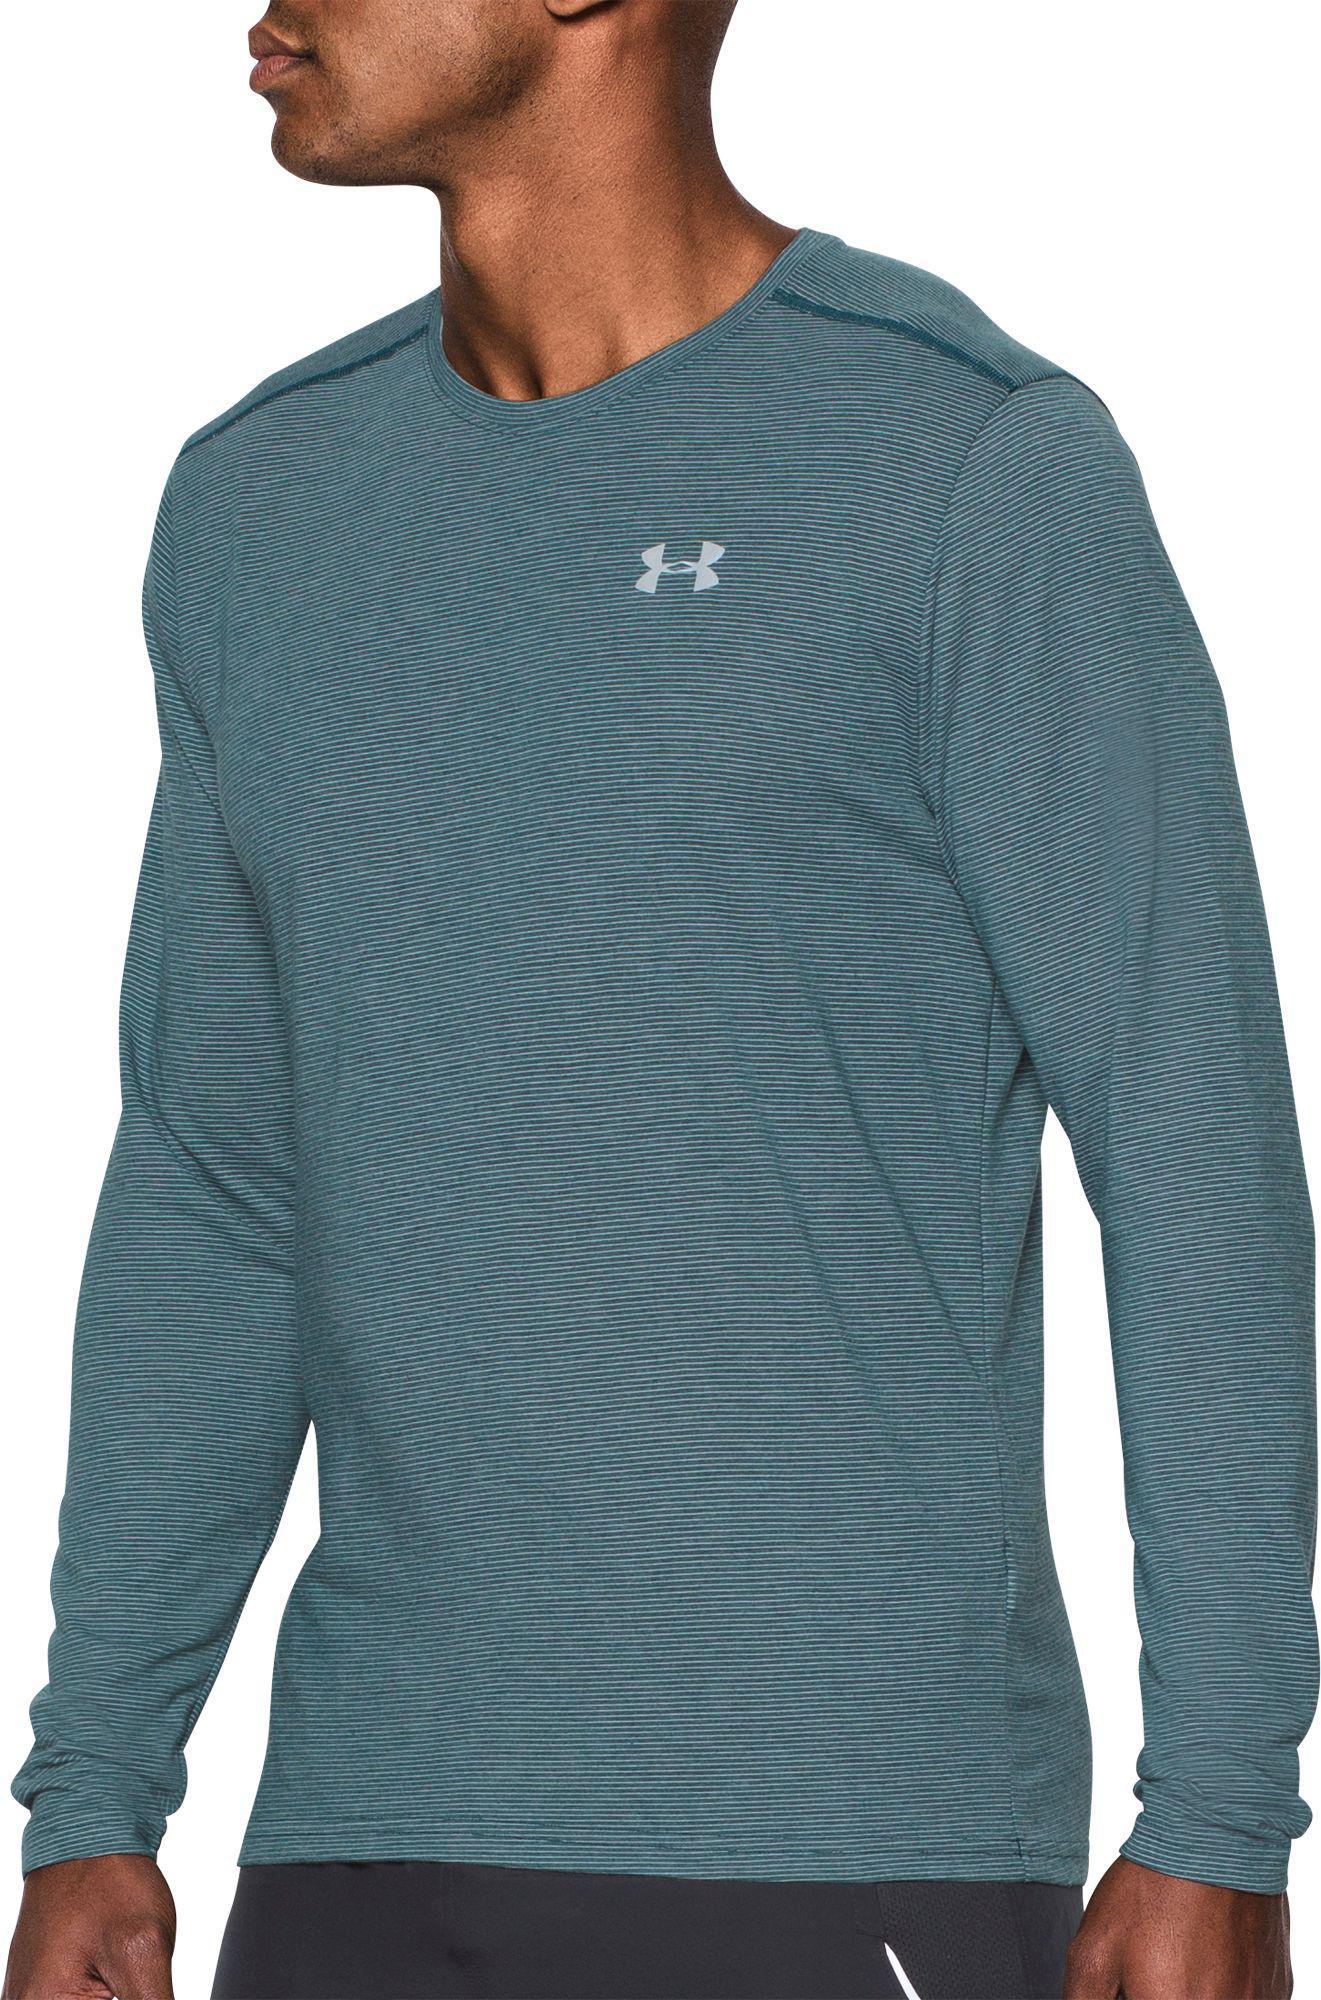 Black Soft And Antislippery Men's Clothing Under Armour Streaker 2.0 Half Zip Long Sleeve Mens Running Top